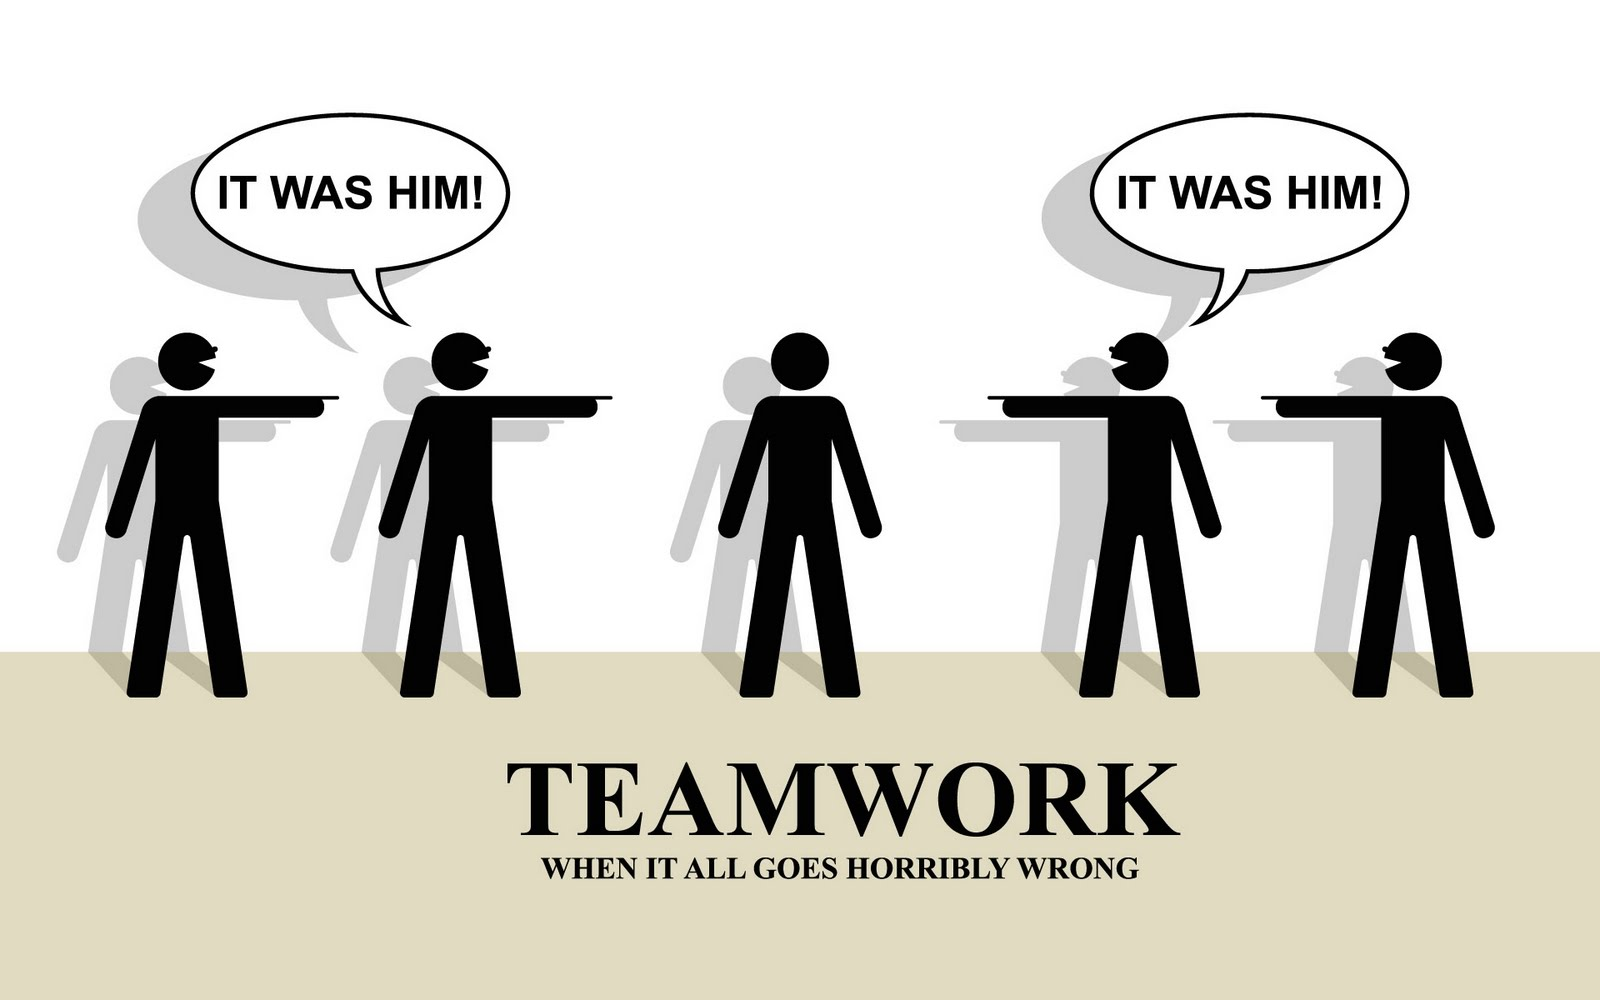 Funny Office Illustrations for team work | Wallpaper Hd Black